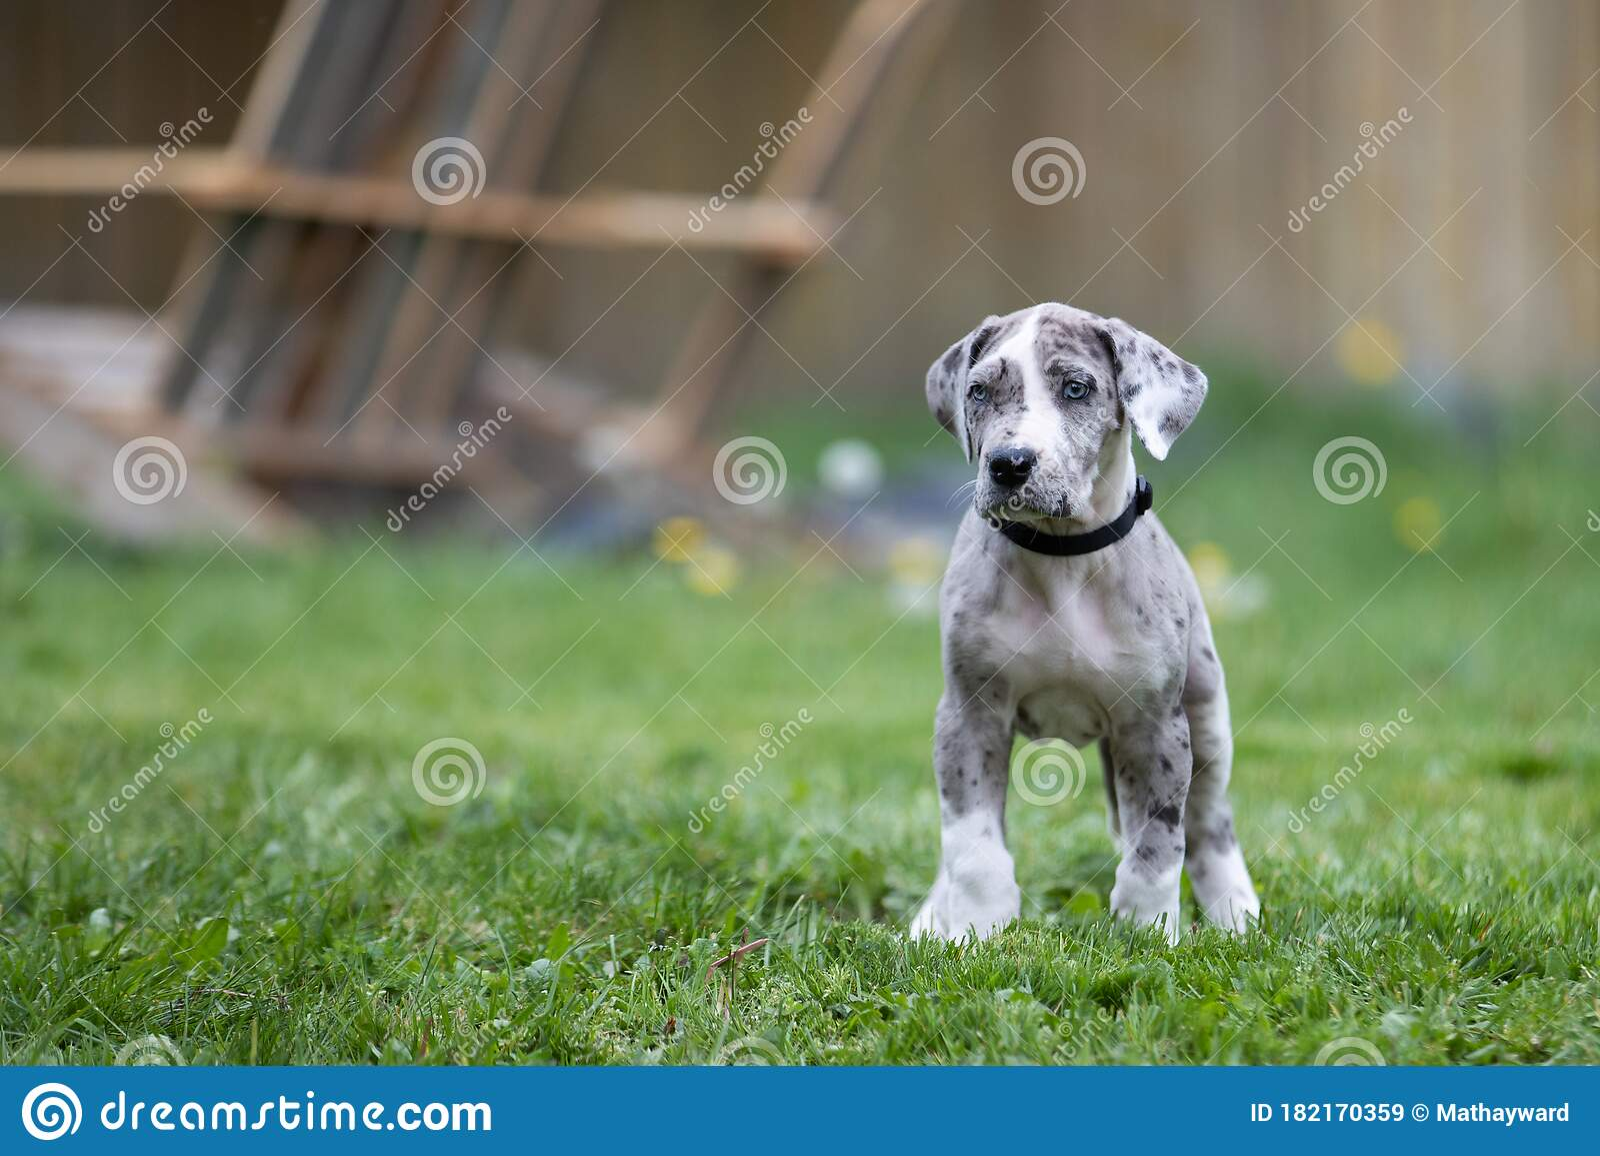 Gray Great Dane Puppy Dog Stock Image Image Of Animal 182170359